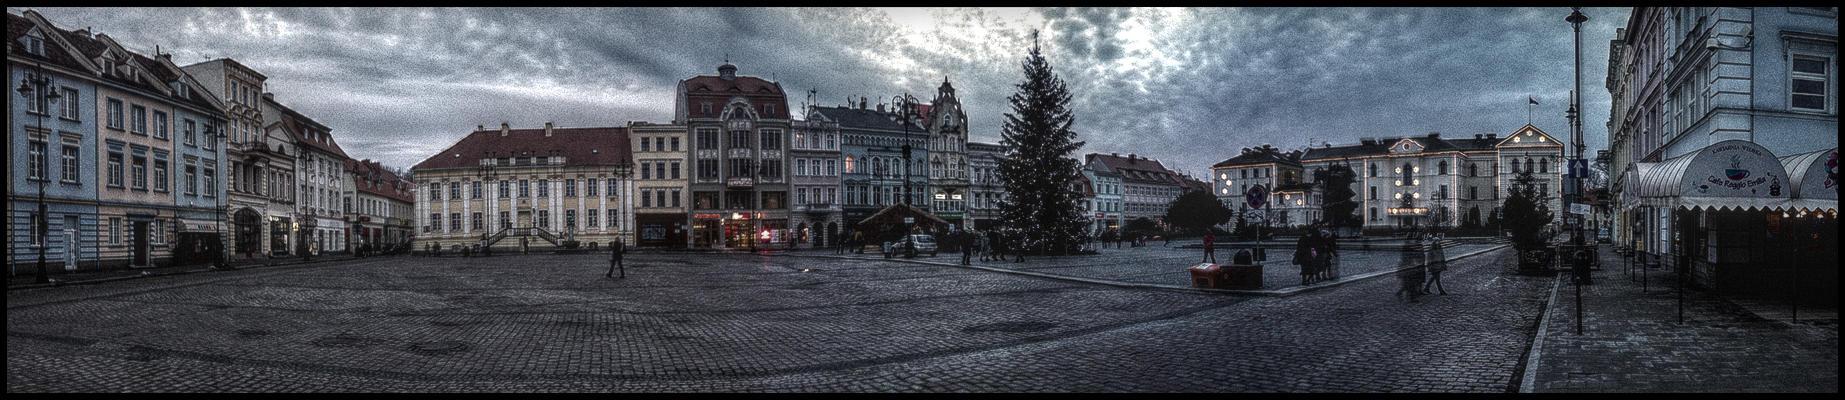 Bydgoszcz (Panorama|HDR) by skywalkerdesign